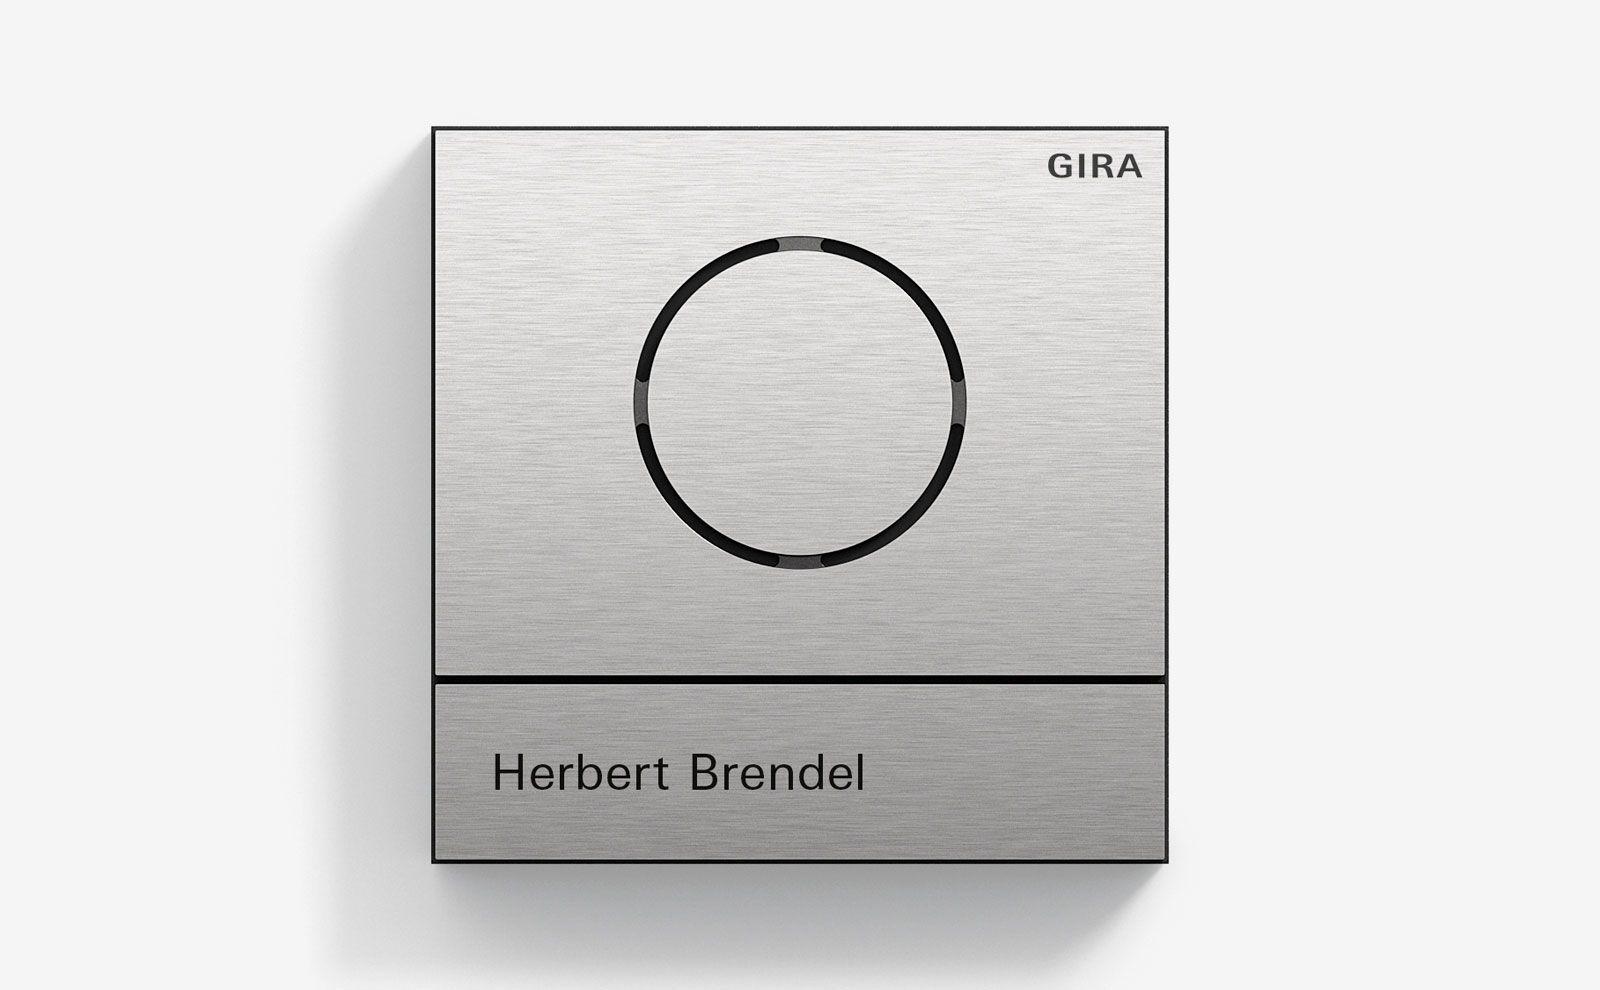 b2c_3_10_1_1_Gira_System_106_Bild_06